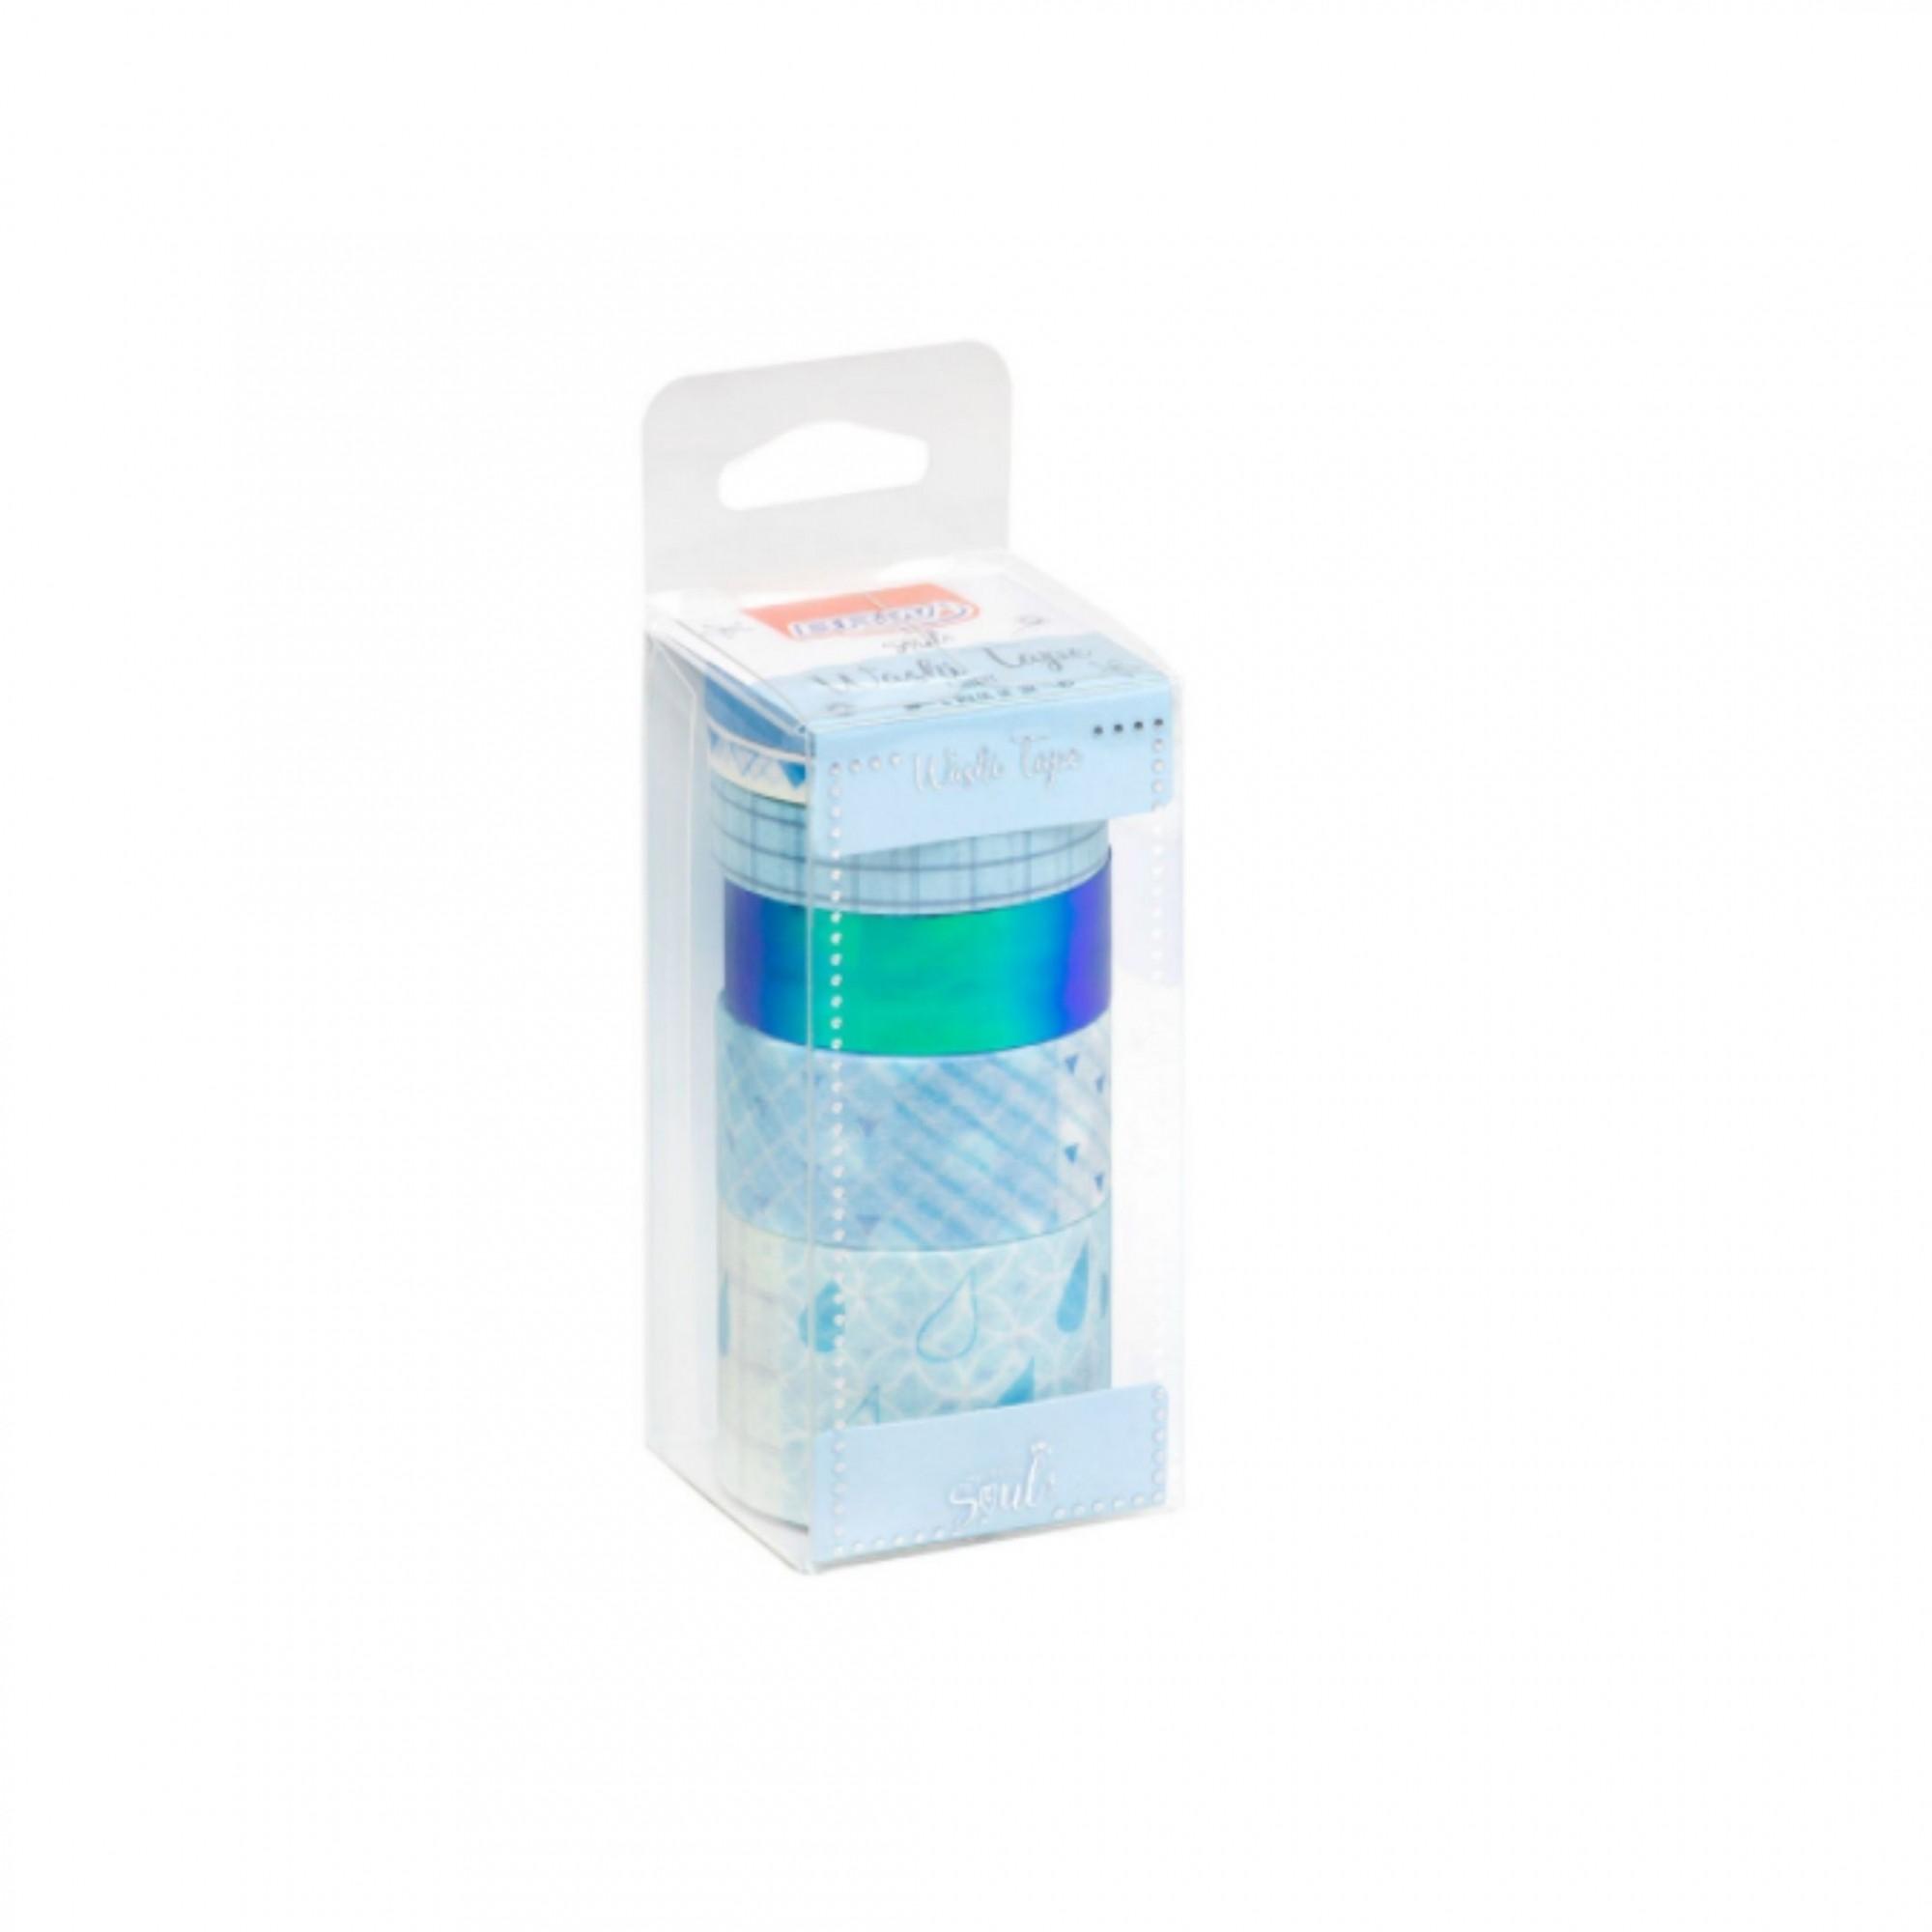 Washi Tape Candy BRW c/4 fitas adesivas